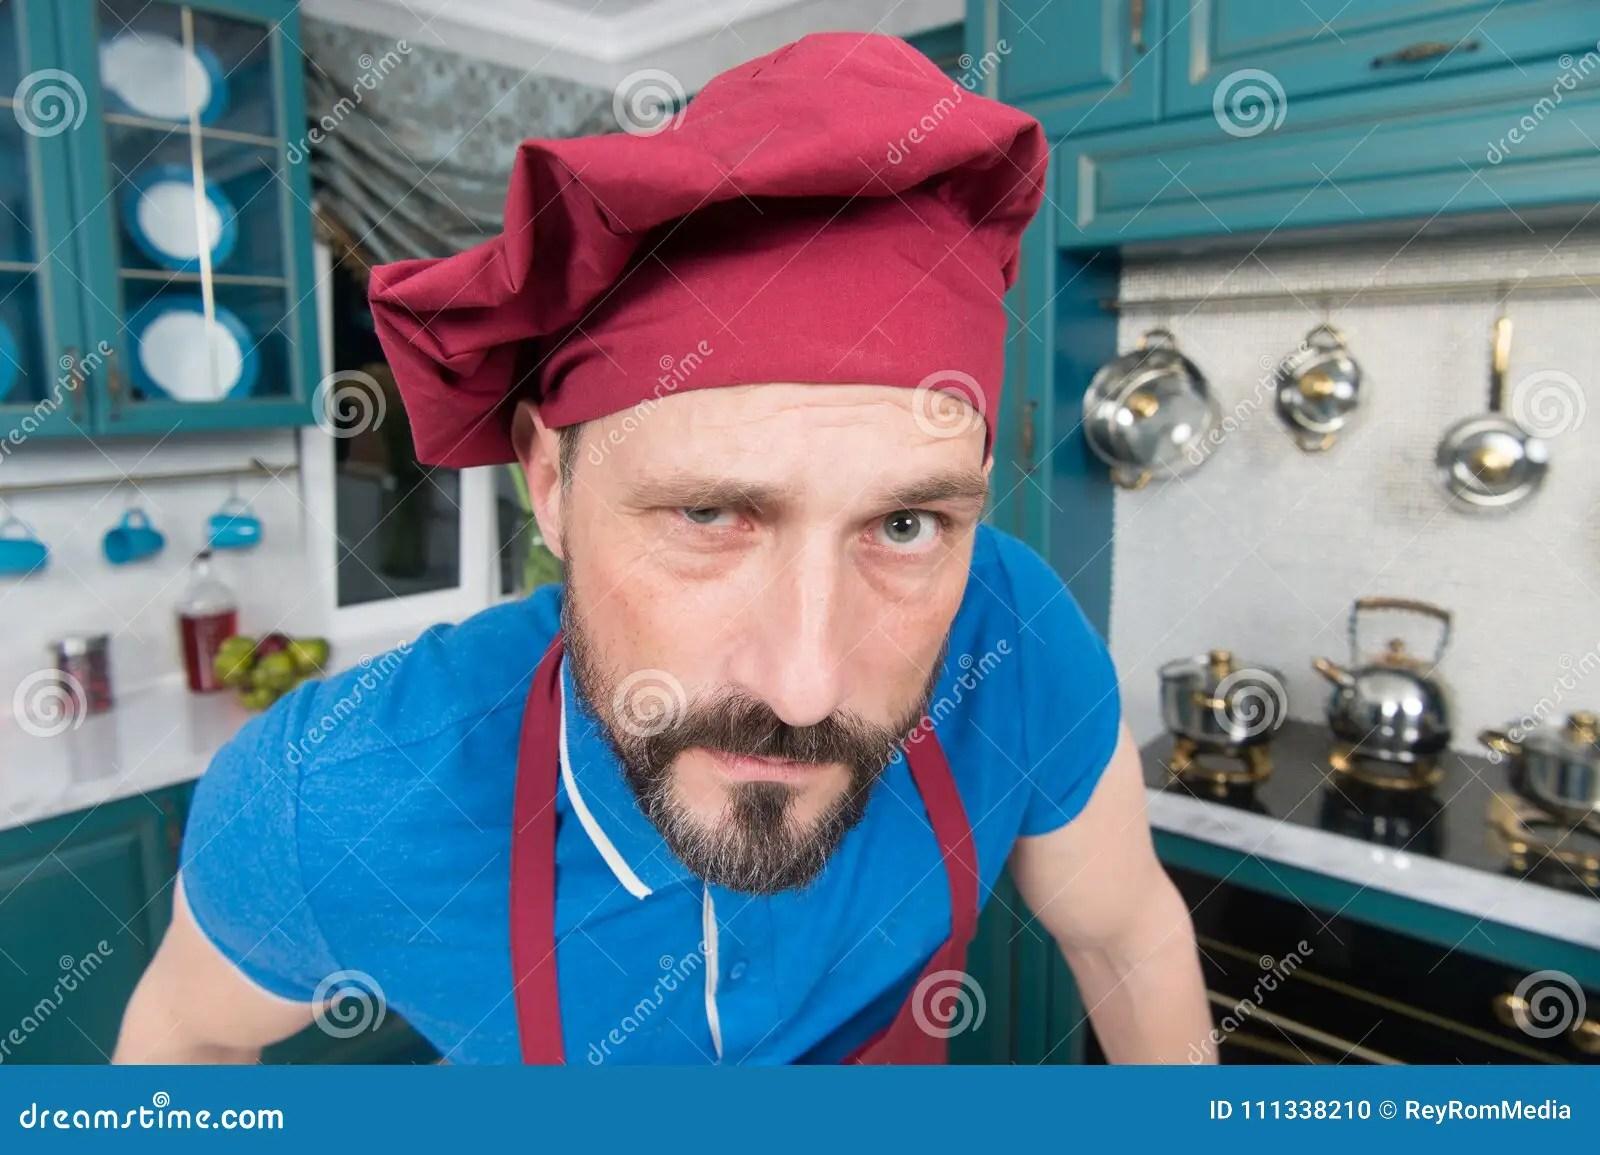 kitchen hats aid tv offer 厨师画象有可疑扫视的帽子的有胡子的厨师围裙的恼怒的人在厨房有困惑的 帽子的有胡子的恼怒的厨师围裙的恼怒的人在厨房有困惑的神色的有胡子的人有可疑扫视的厨师厨师画象帽子的